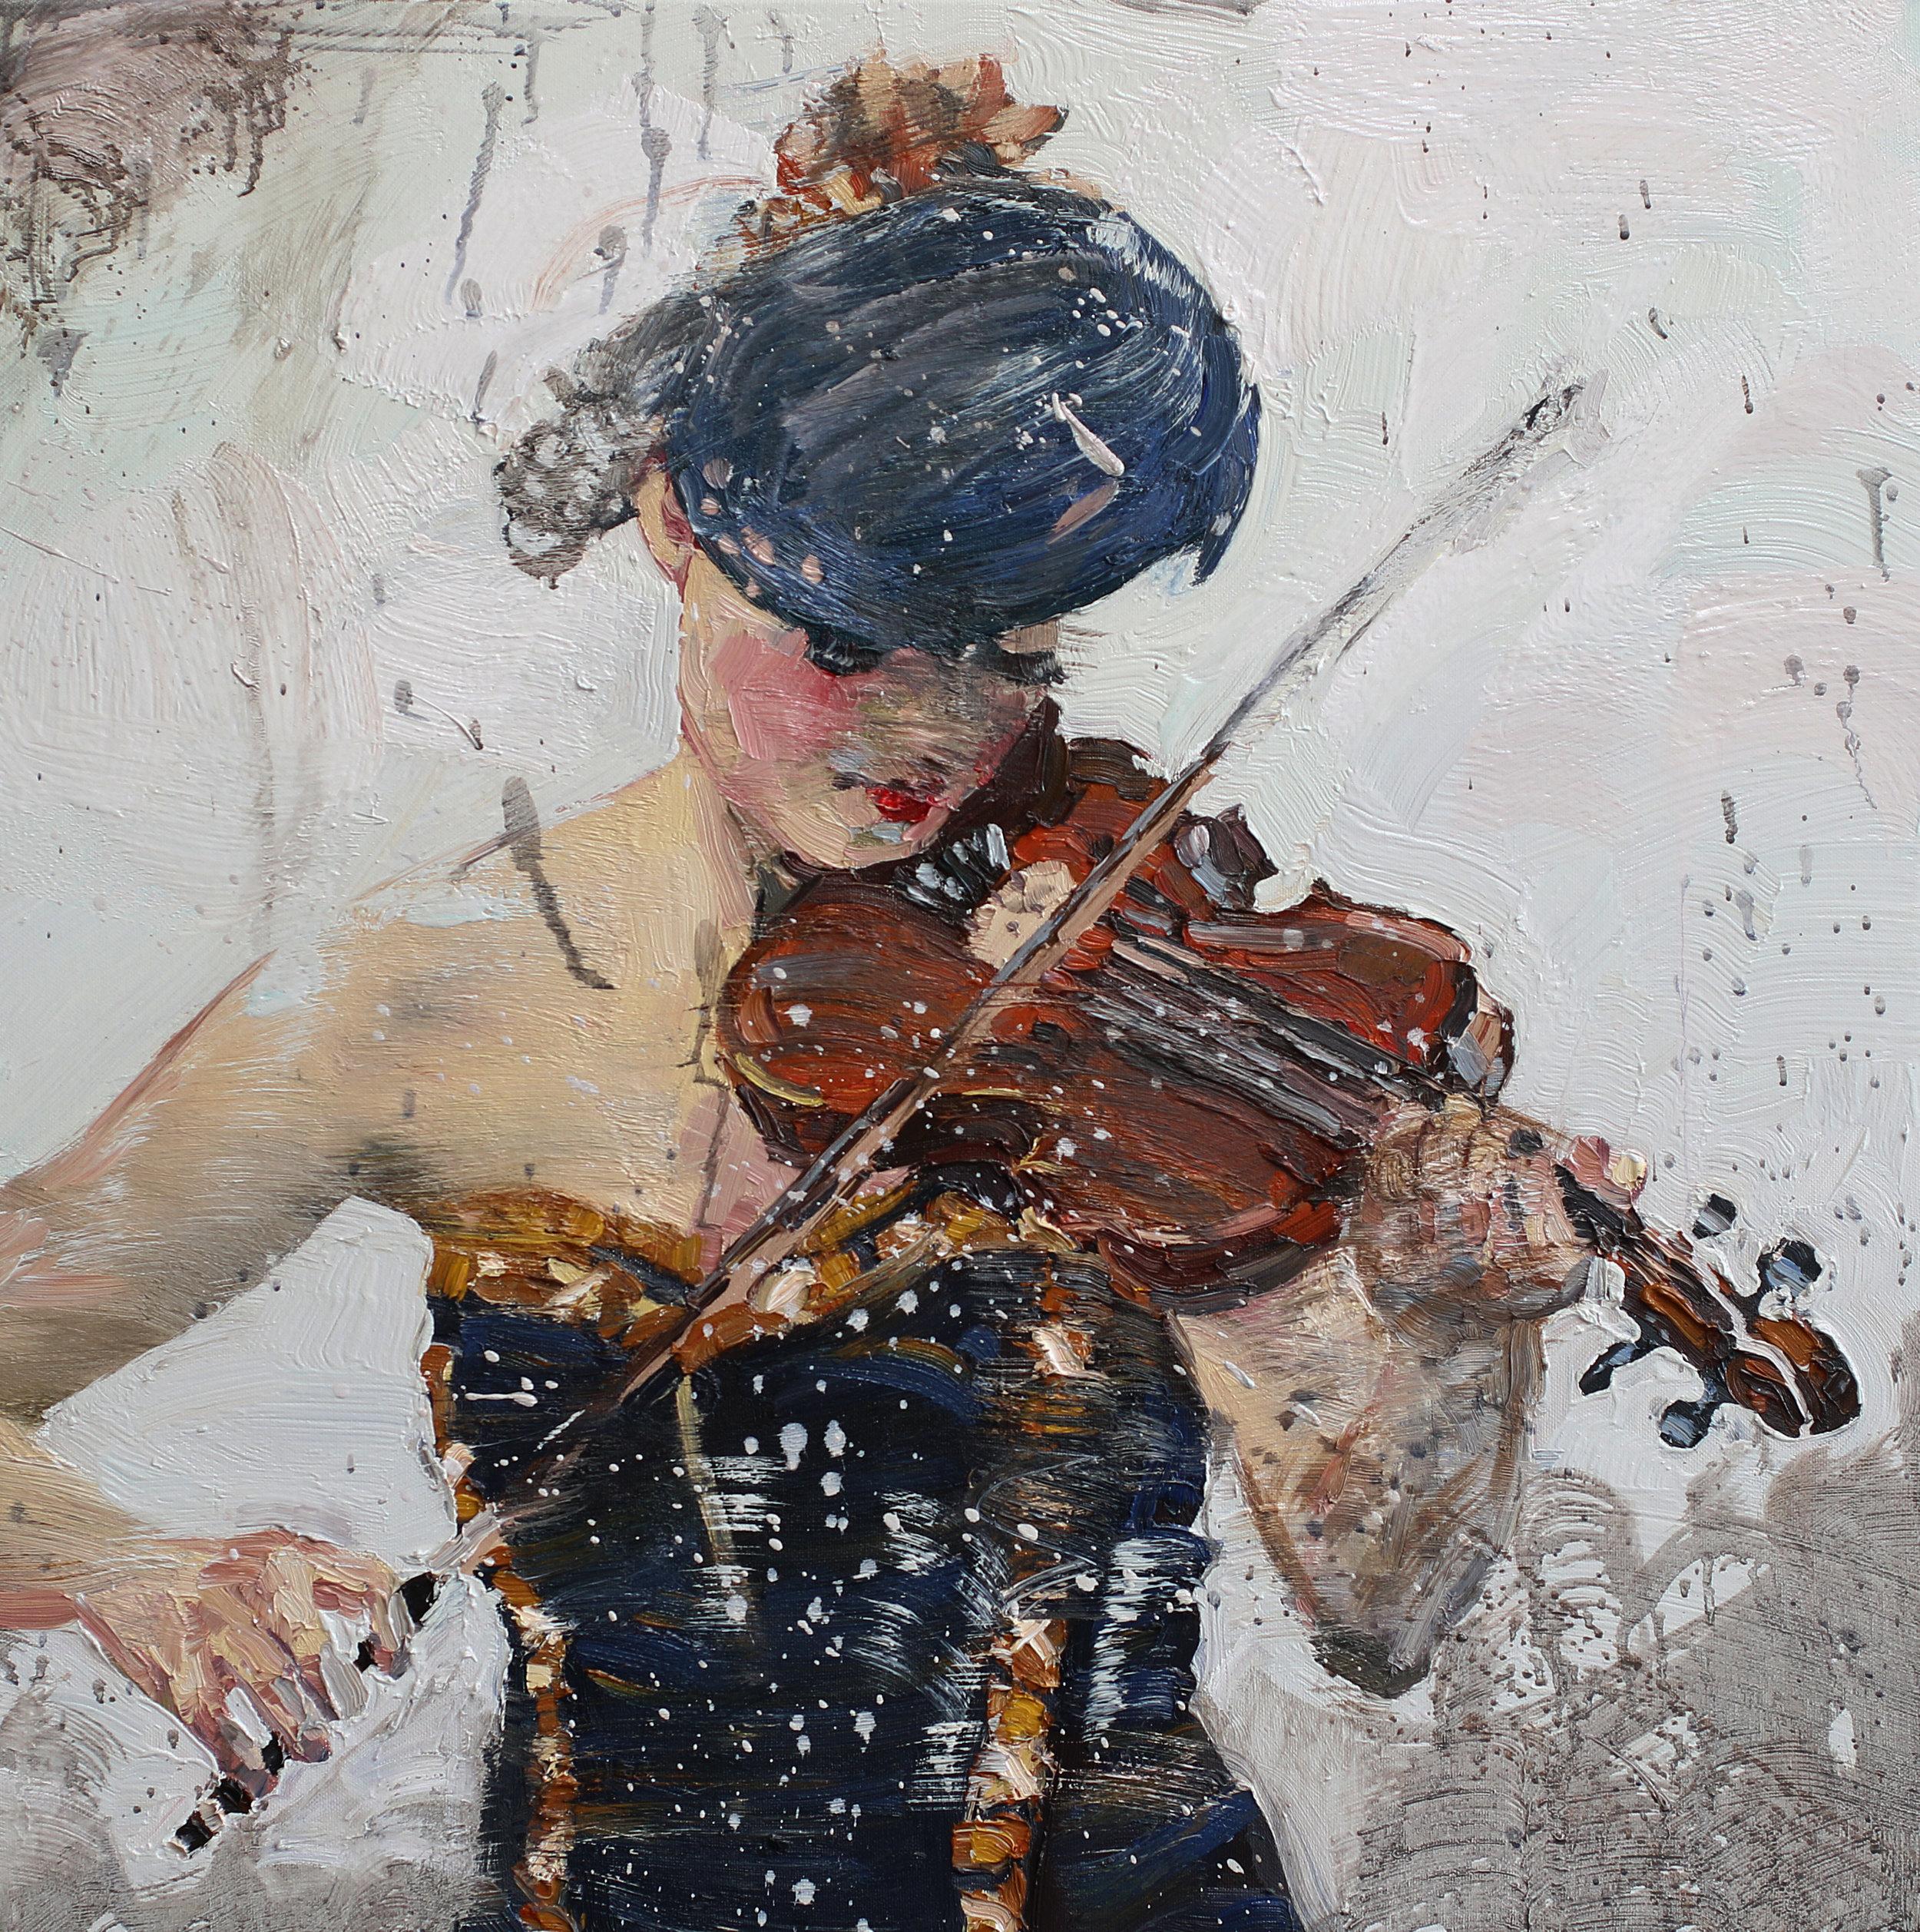 Fiolinist II   Studie   70x70 cm   Olje på lerret   Privat eie